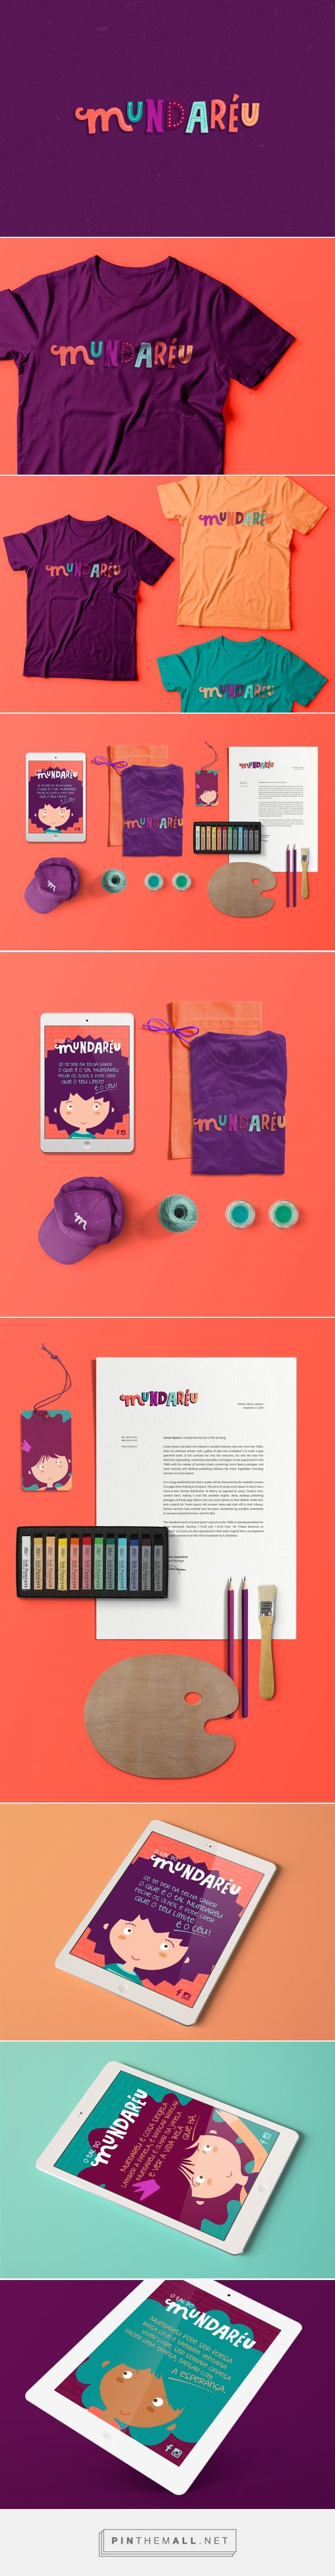 Mundaréu Identity by Carmelita Design on Behance   Fivestar Branding – Design and Branding Agency & Inspiration Gallery